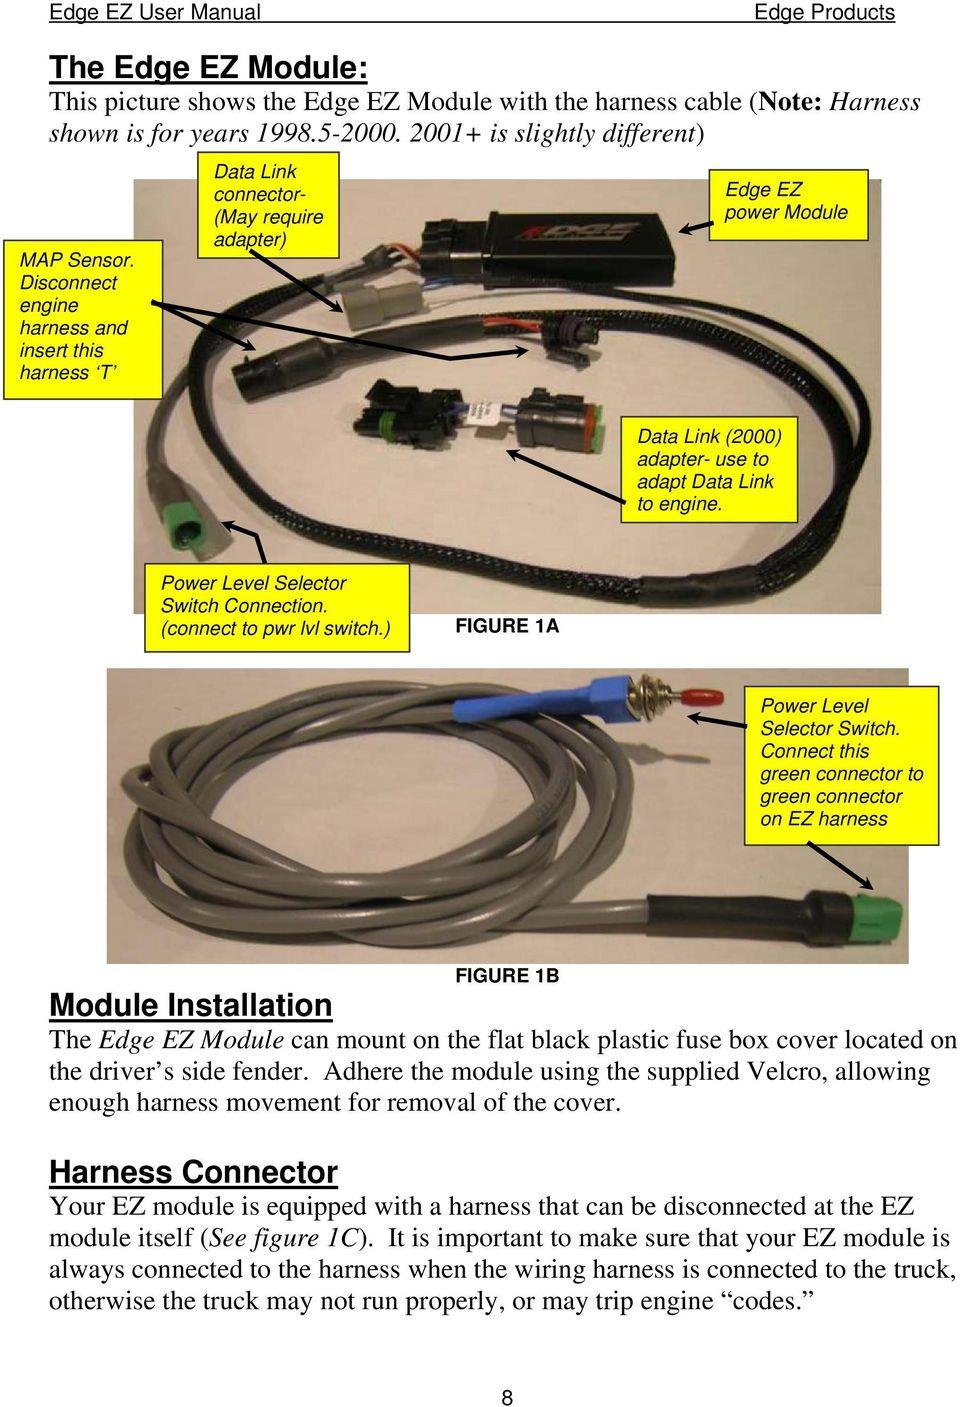 medium resolution of dodge cummins 5 9l 24 valve edge products ez module installation 1995 ez go wiring diagram edge ez wiring diagram